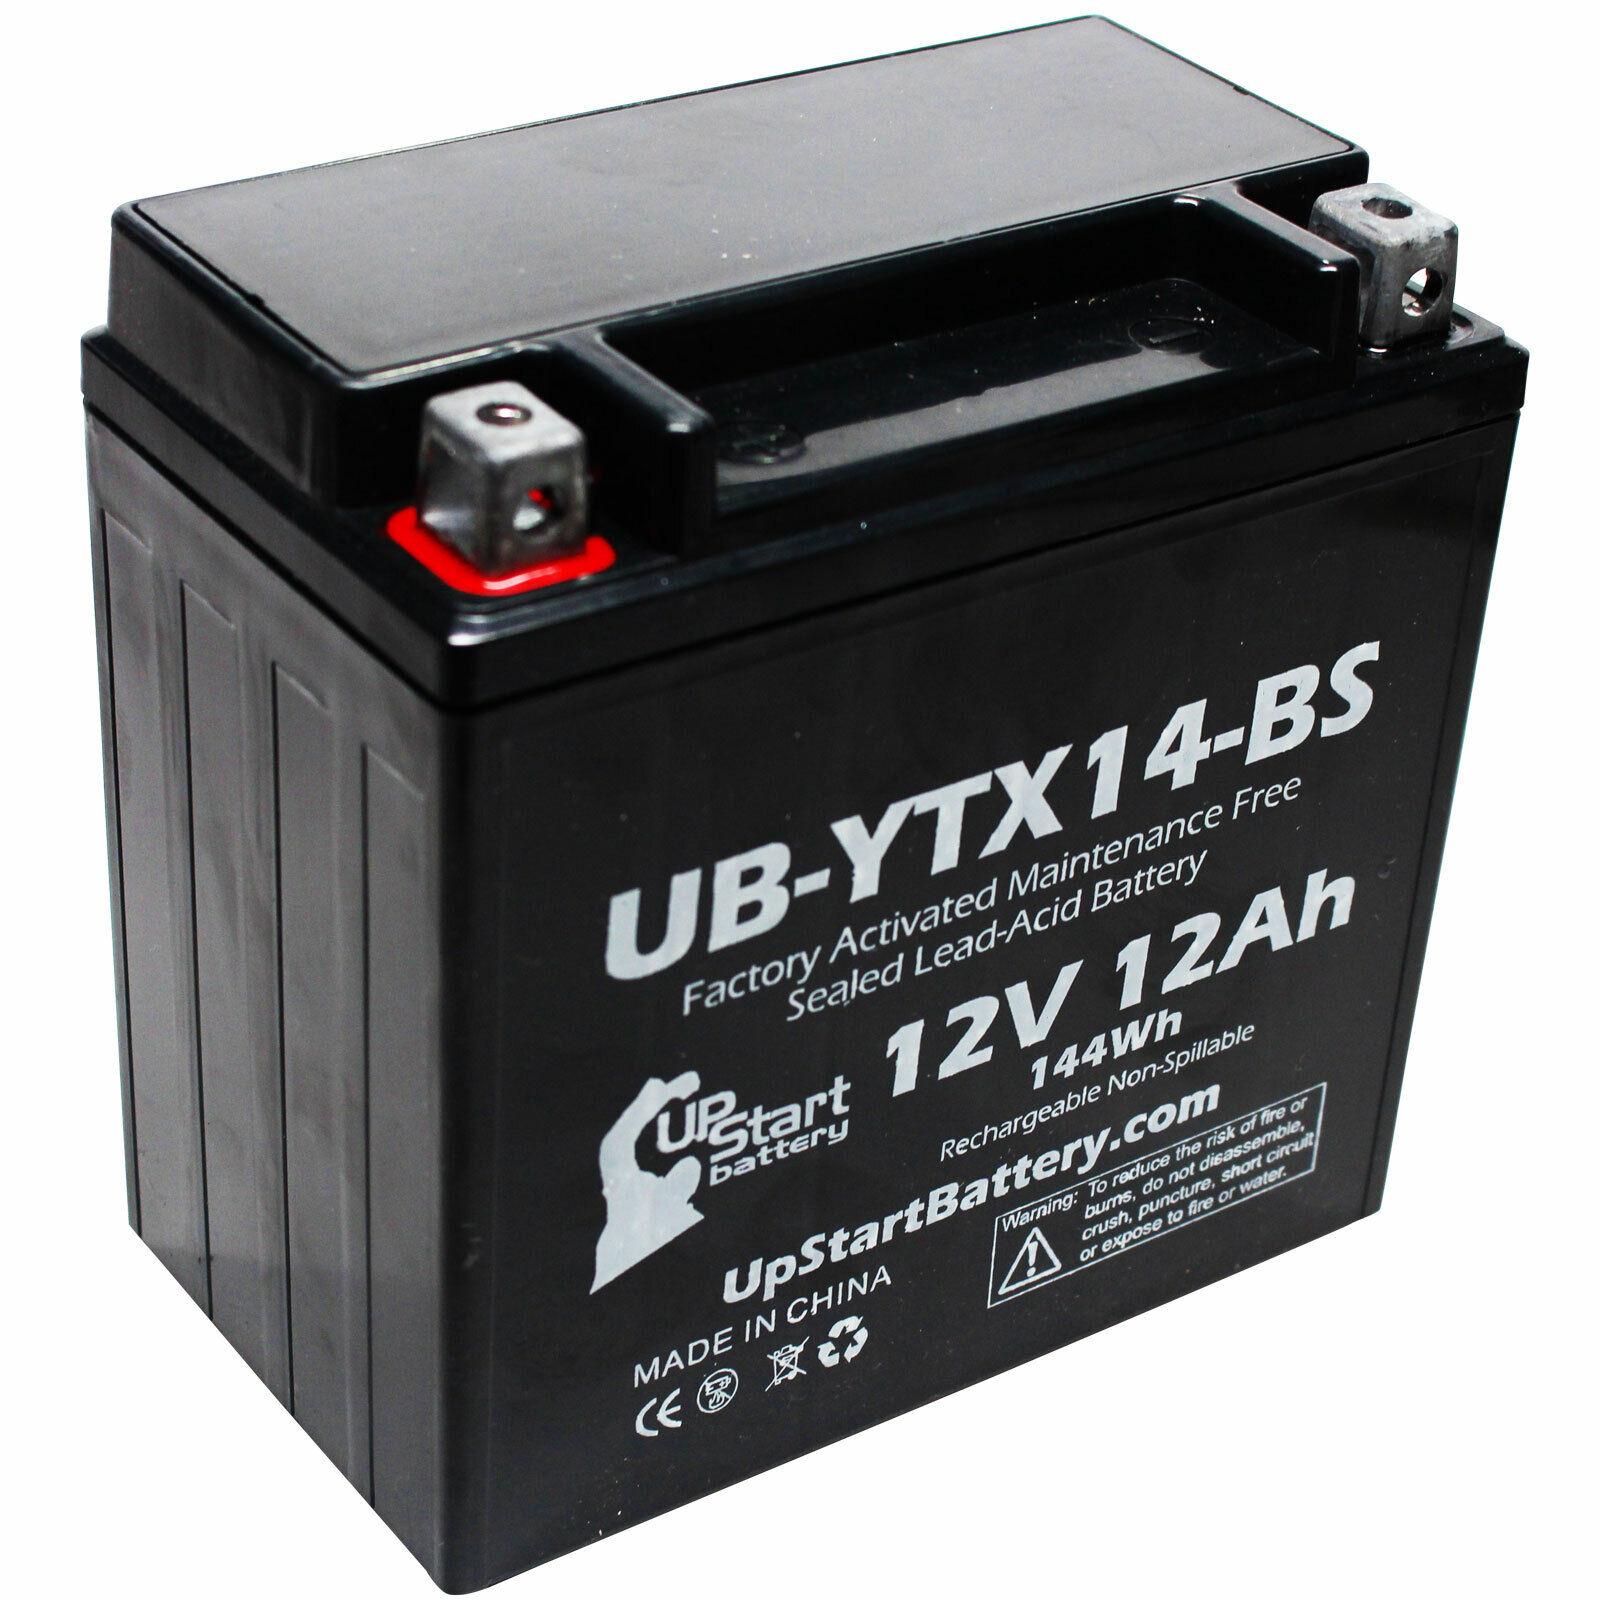 12V 12AH Battery for 2003 Suzuki SV1000, S 1000 CC